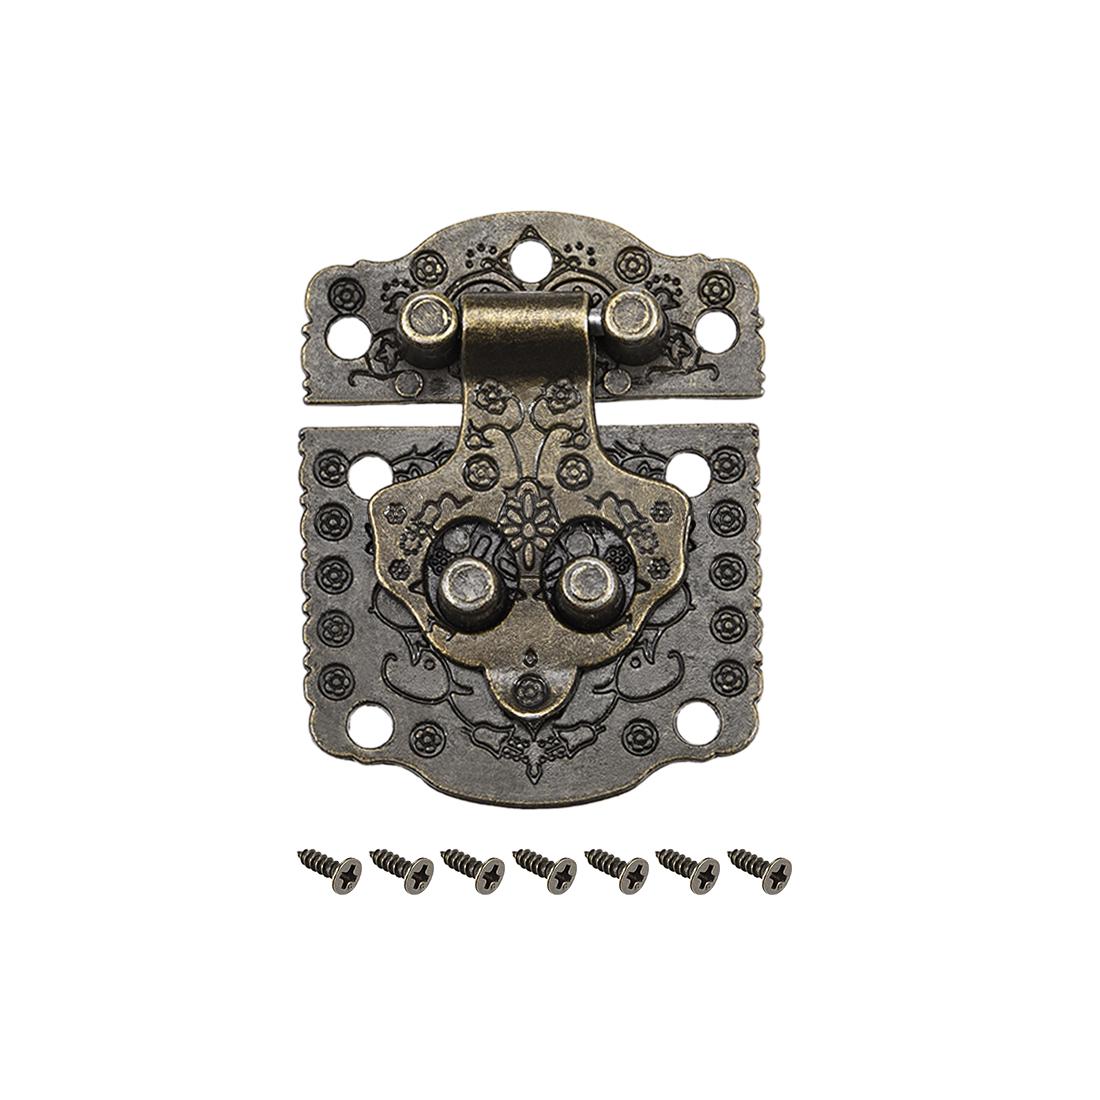 Wood Case Box Rectangle Hasp 50x40mm Antique Latches Hook Bronze Tone, 5 Pcs